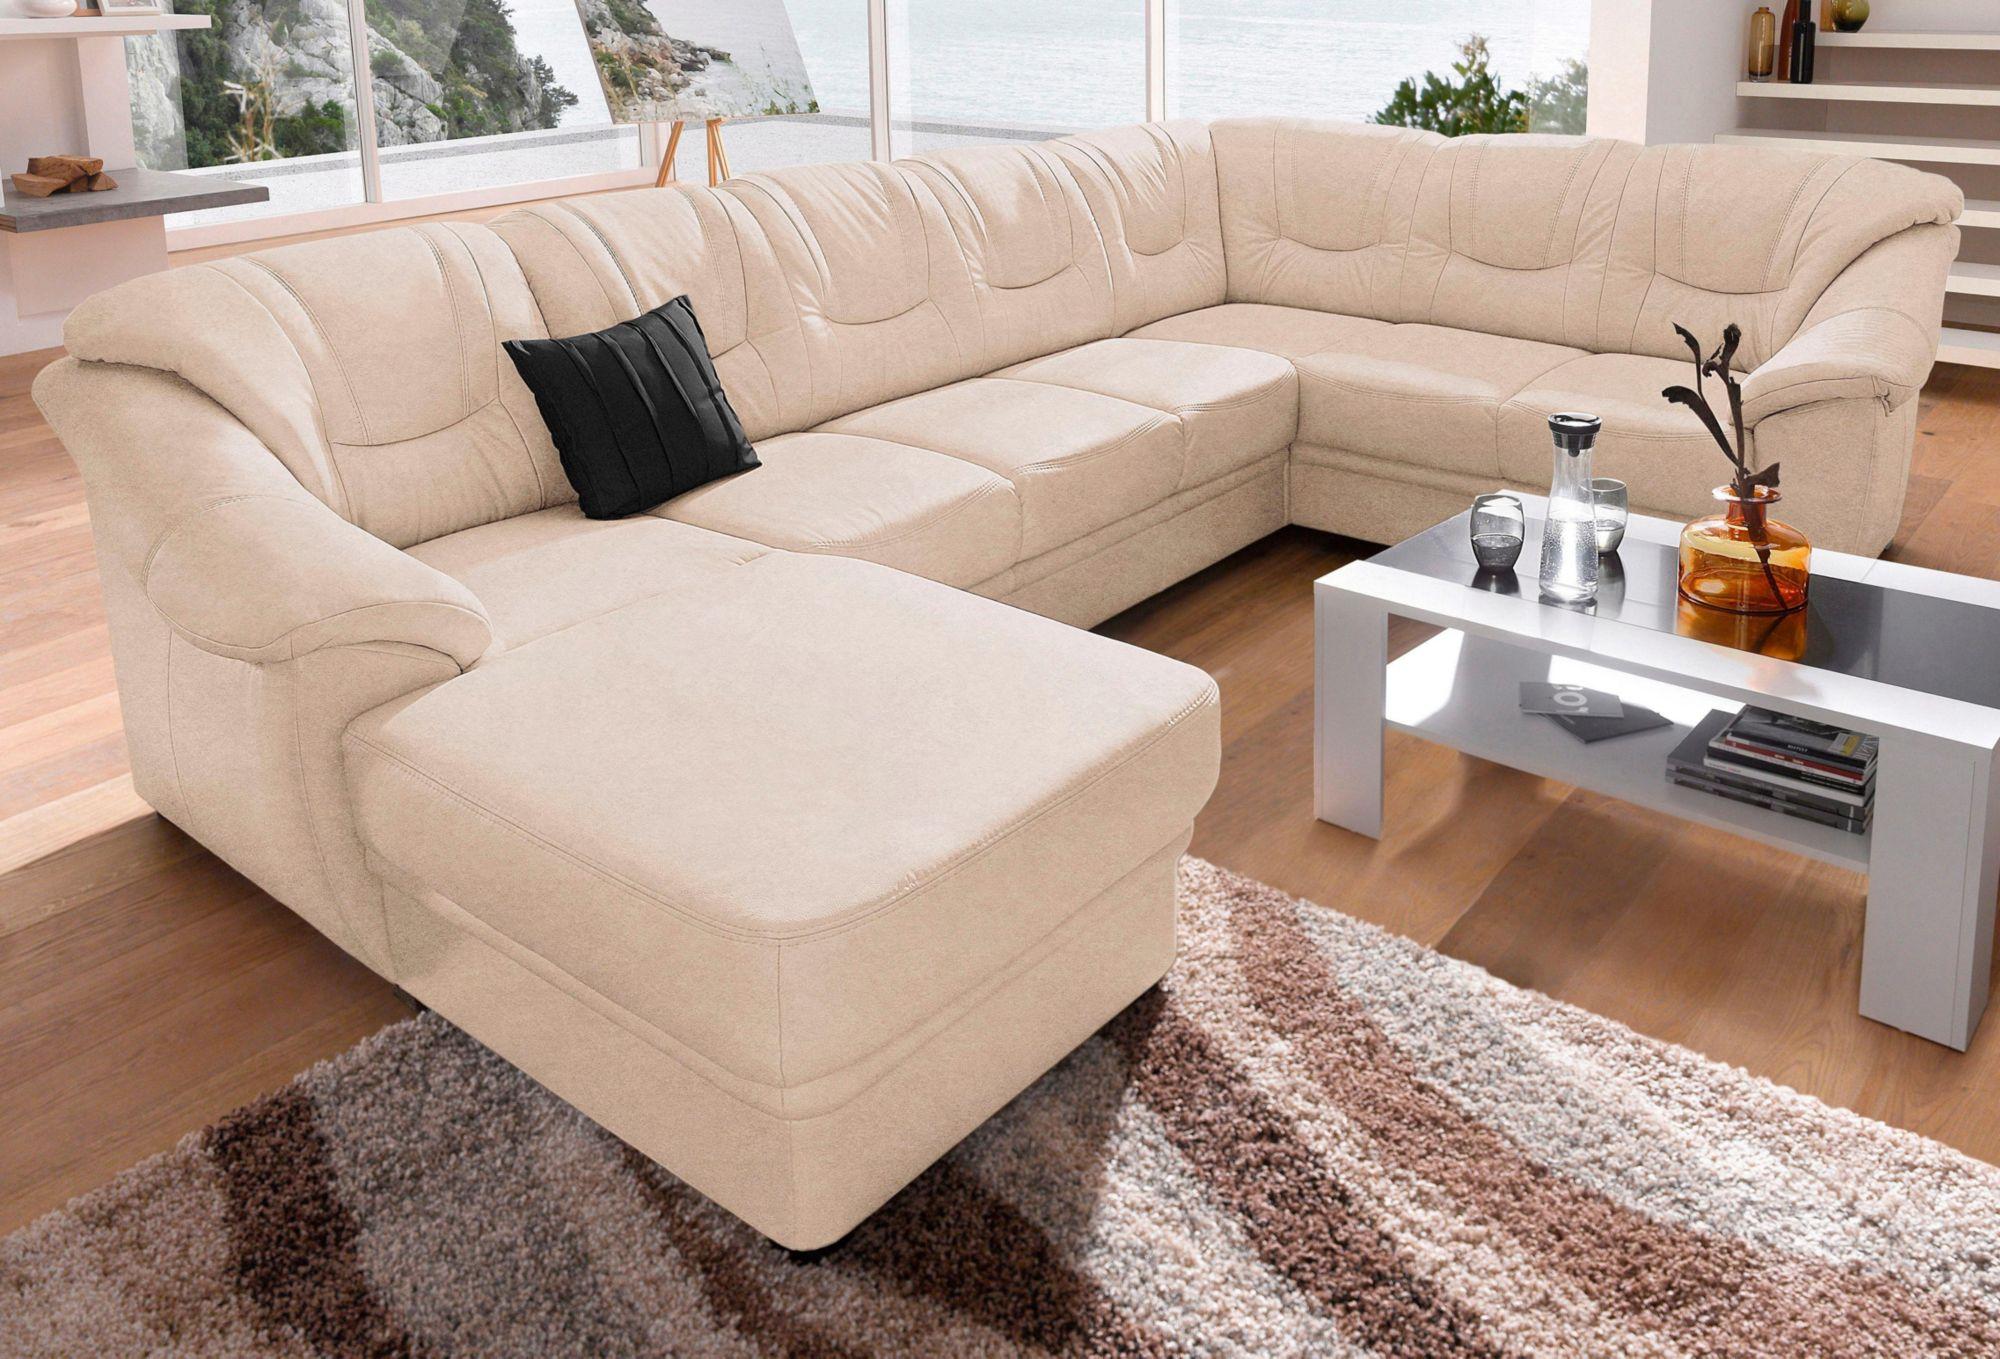 wohnlandschaft sit more wahlweise mit bettfunktion schwab versand leder wohnlandschaft. Black Bedroom Furniture Sets. Home Design Ideas